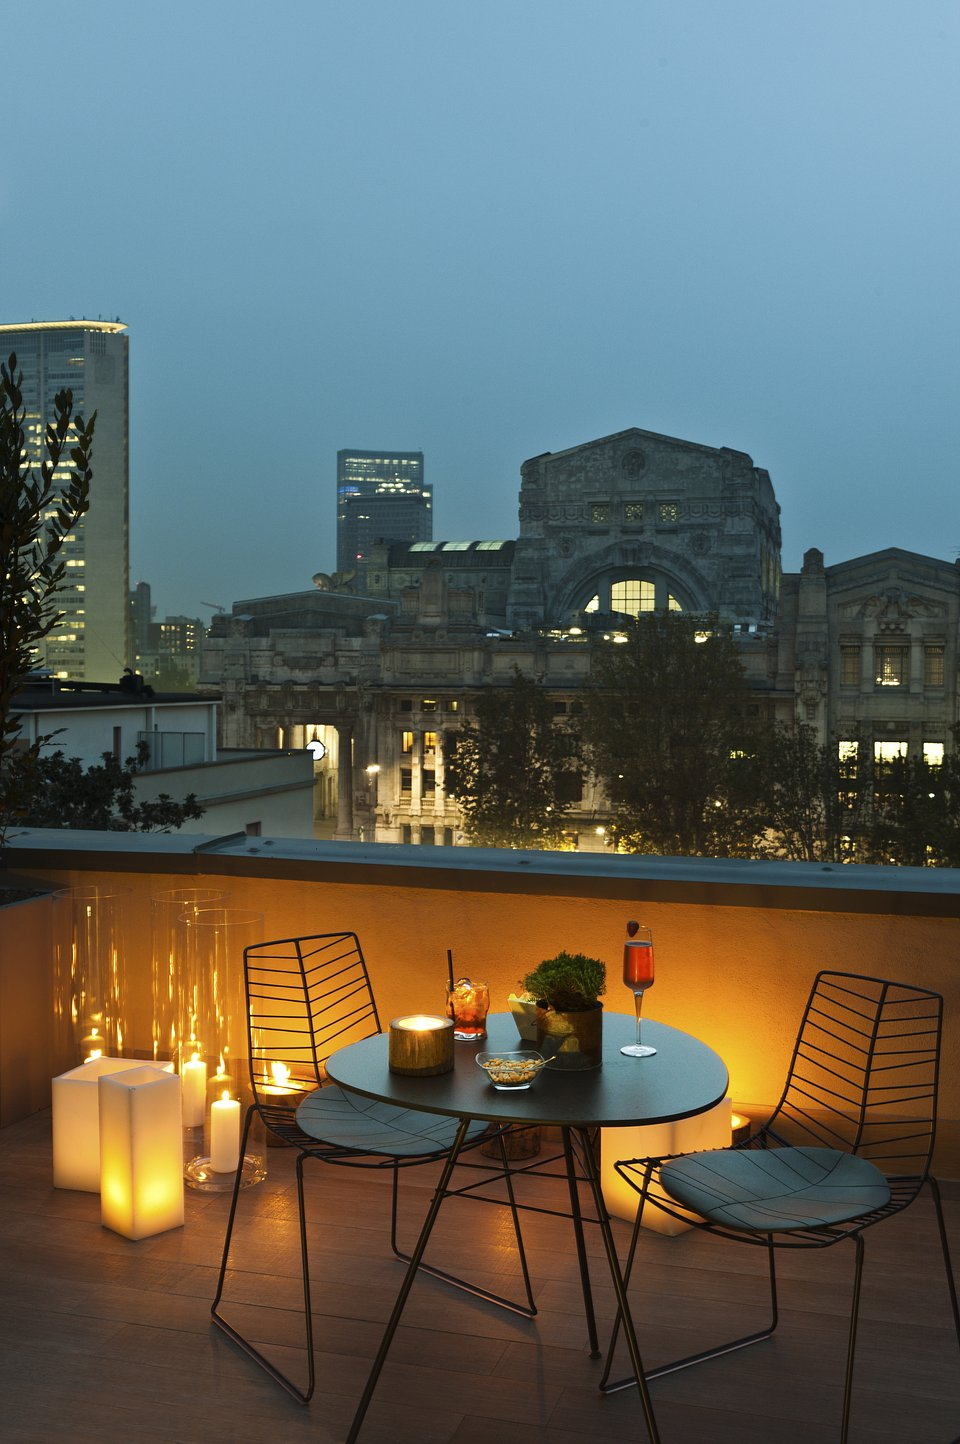 Starhotels Echo_Mi_Terrazza suite by Andrea Auletta (9).jpg